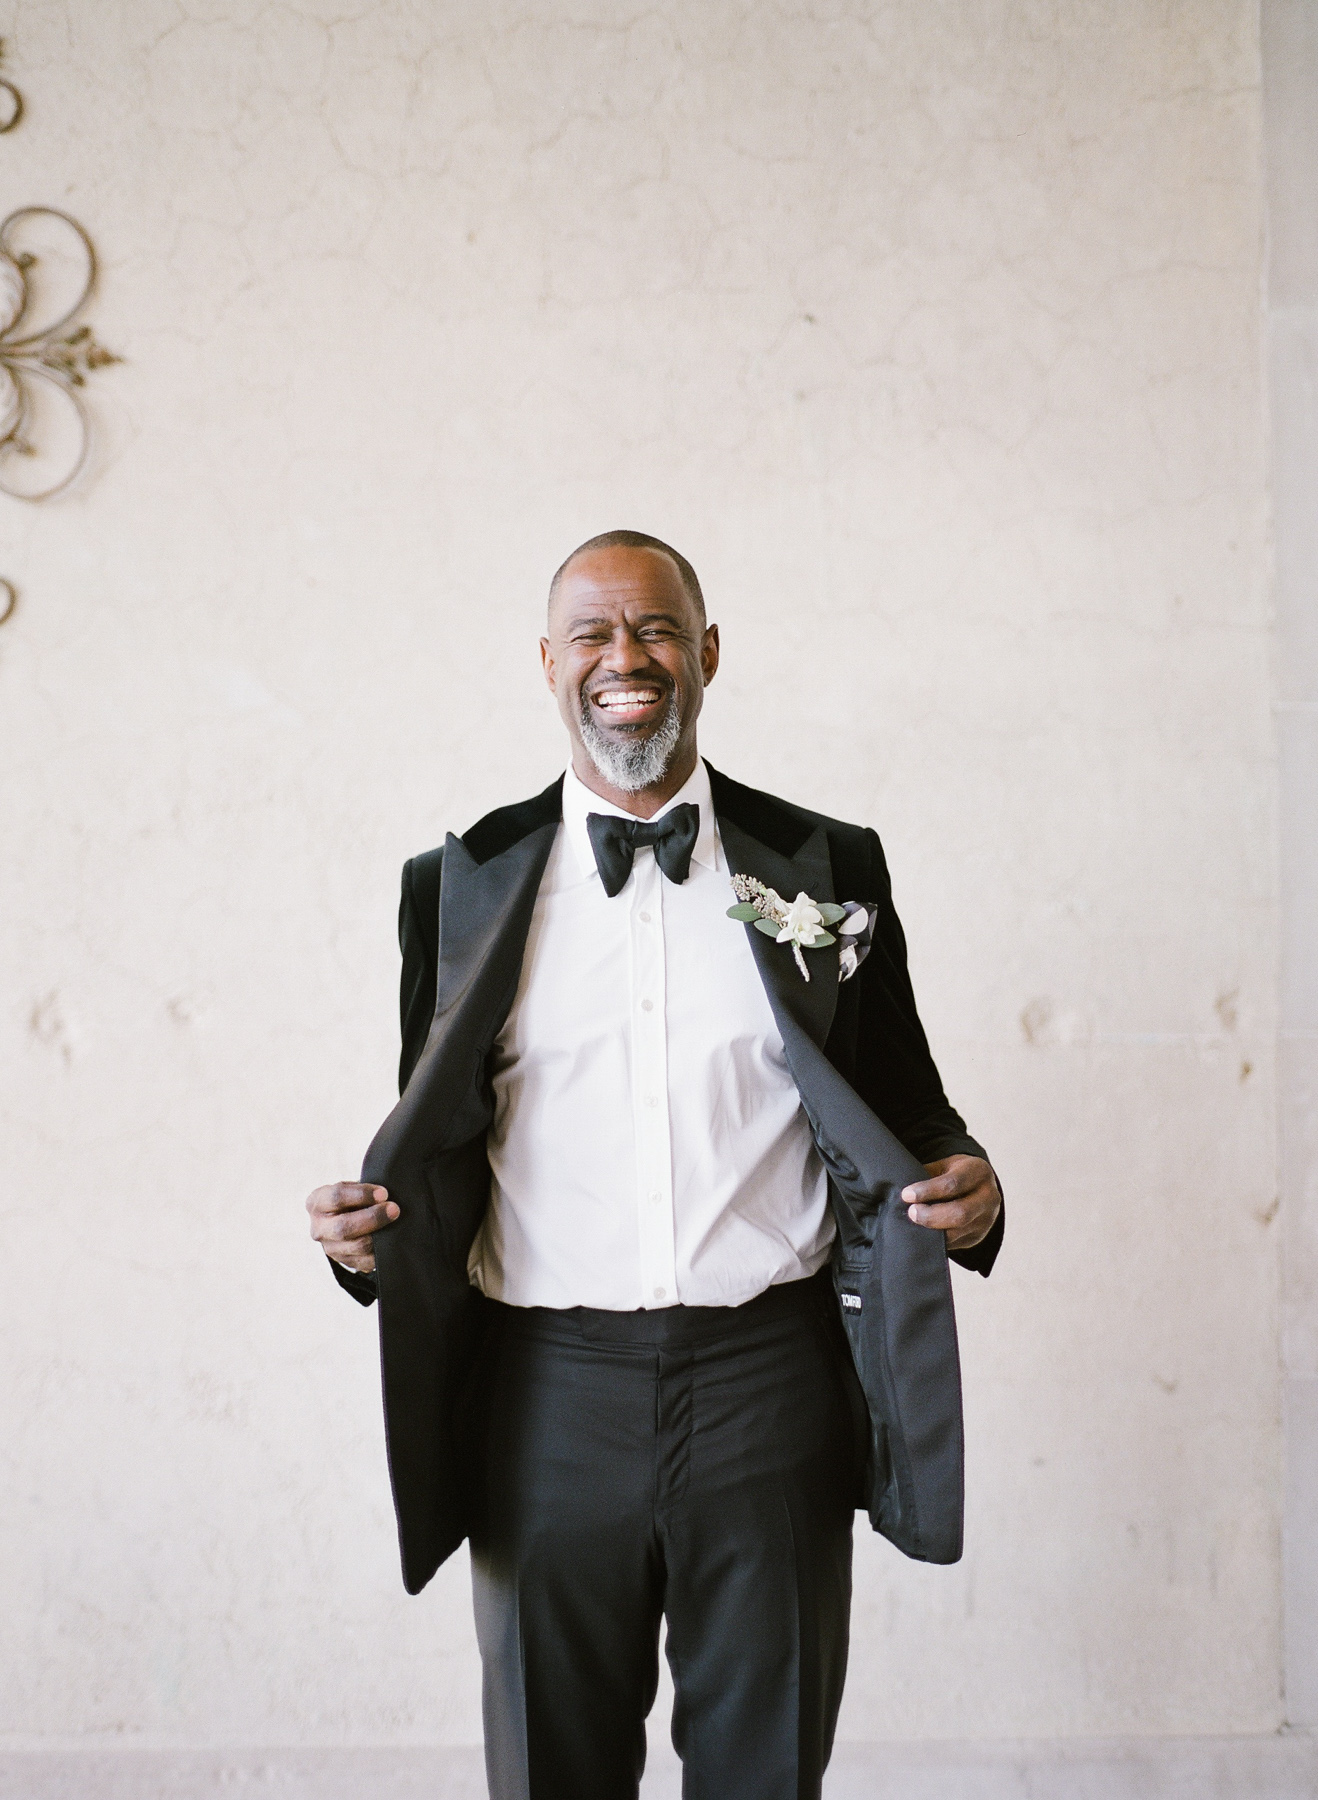 Brian-McKnight-wedding-oheka-castle-043.jpg